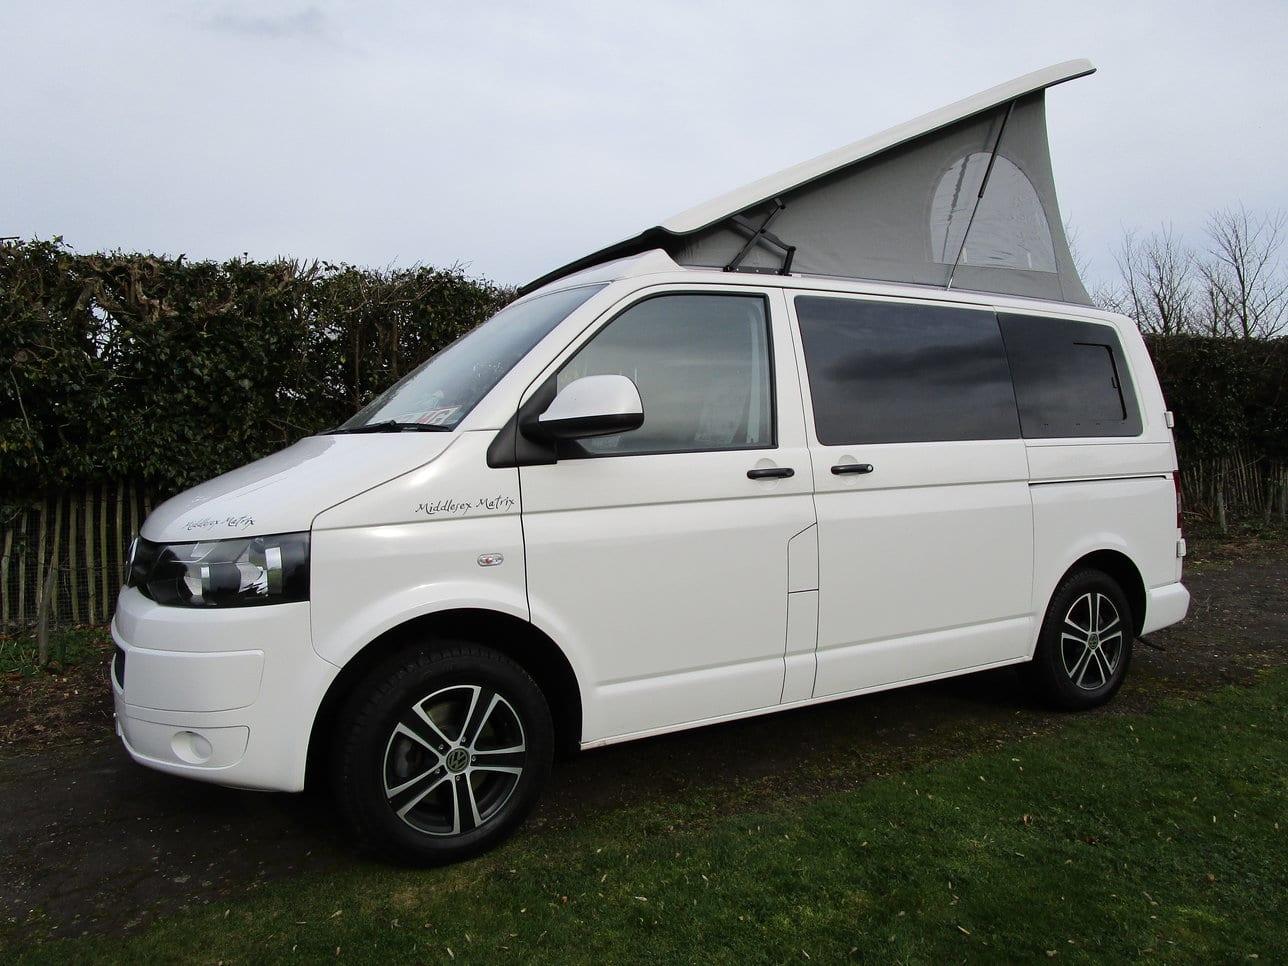 Middlesex Motorcaravans Ltd